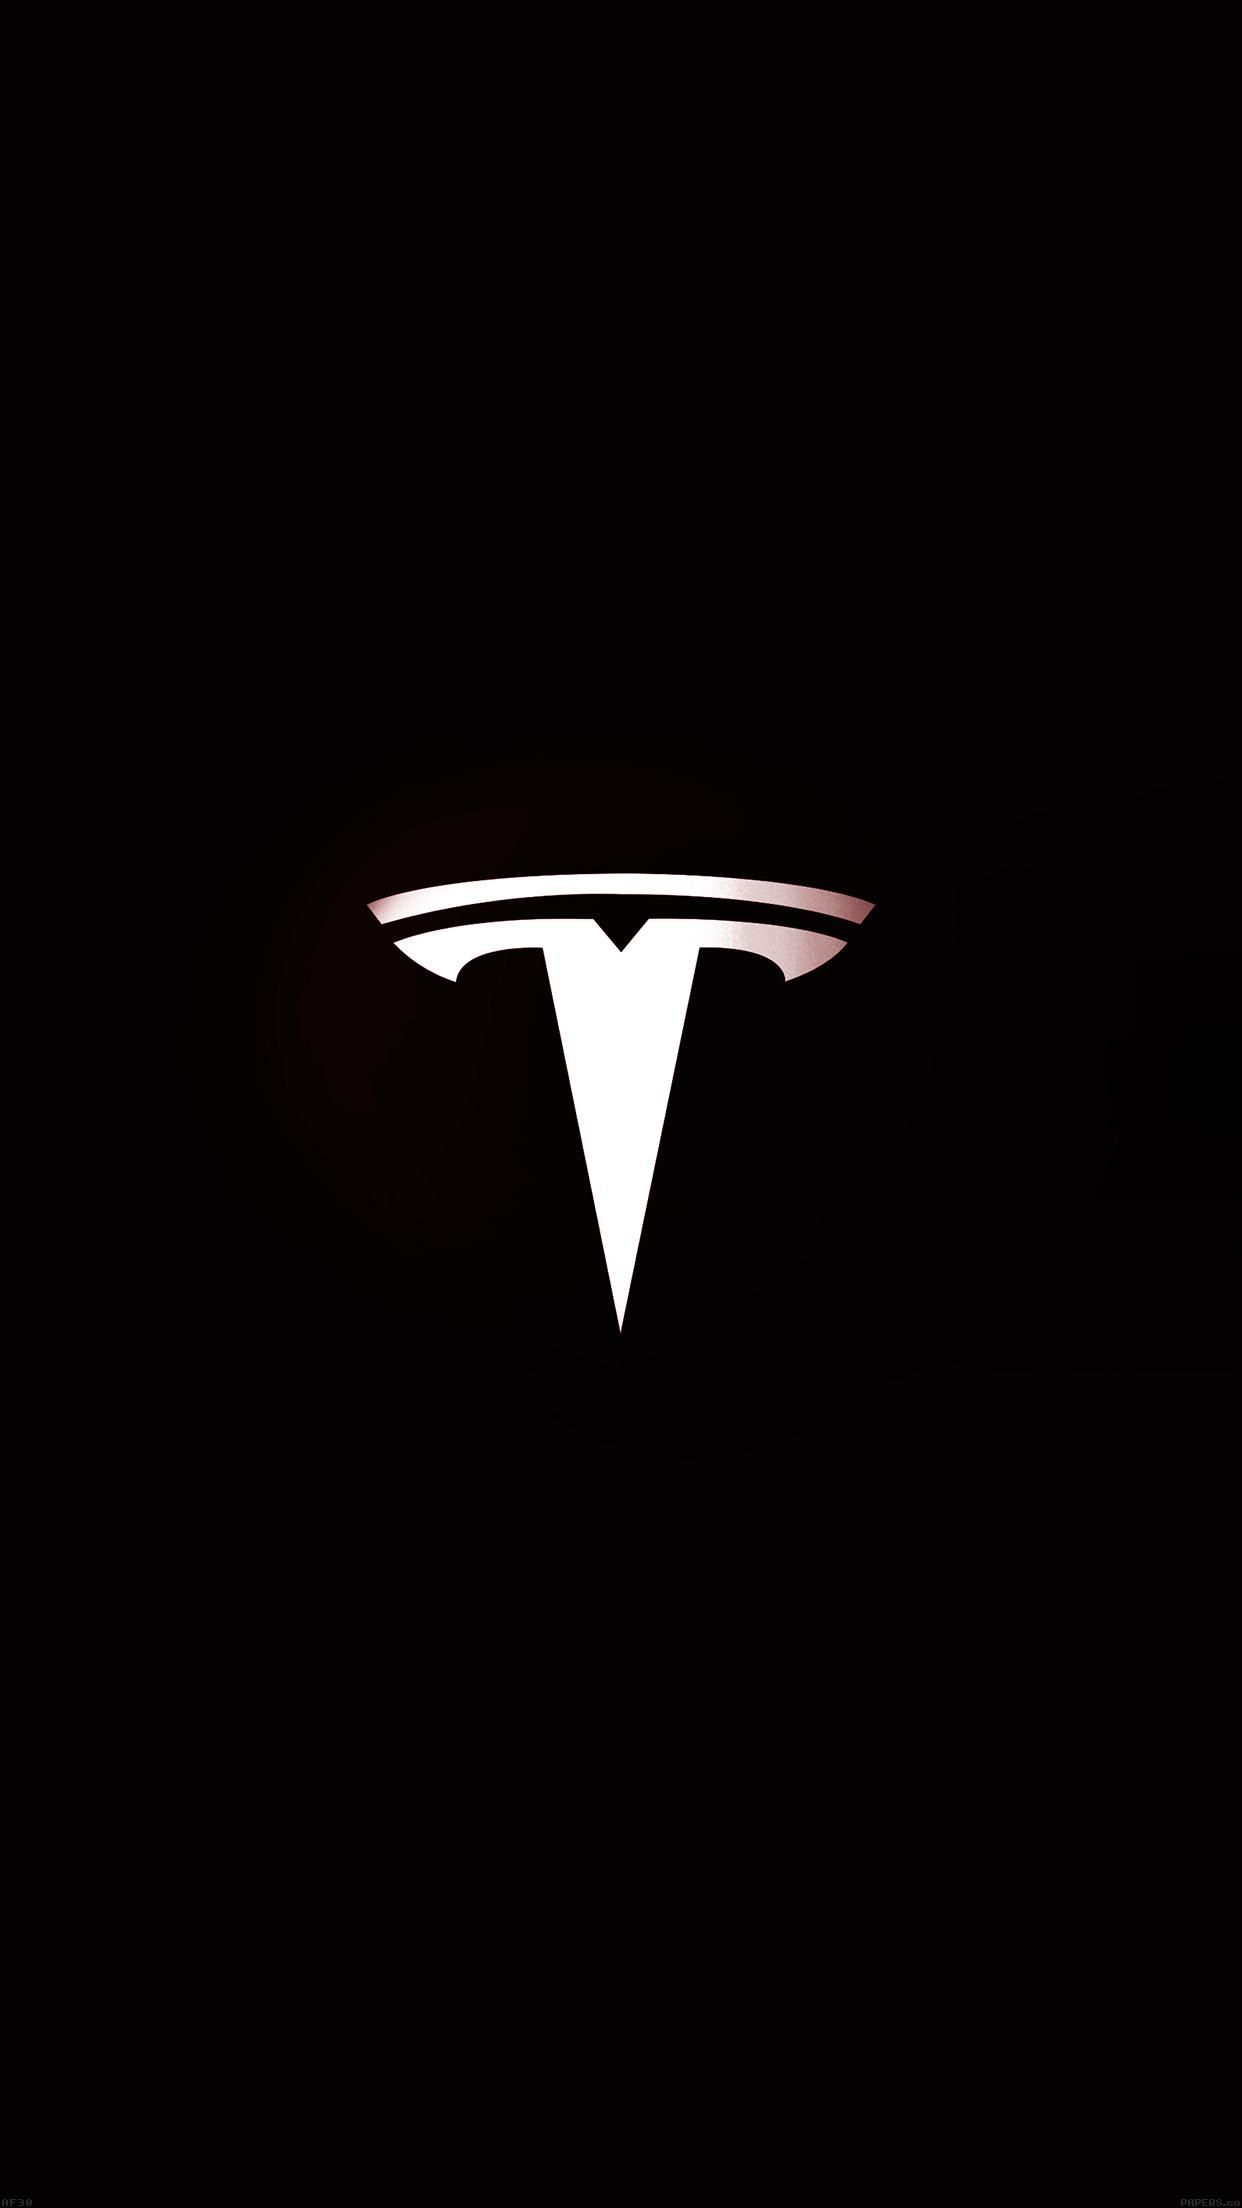 Tesla Logo Iphone Wallpapers Top Free Tesla Logo Iphone